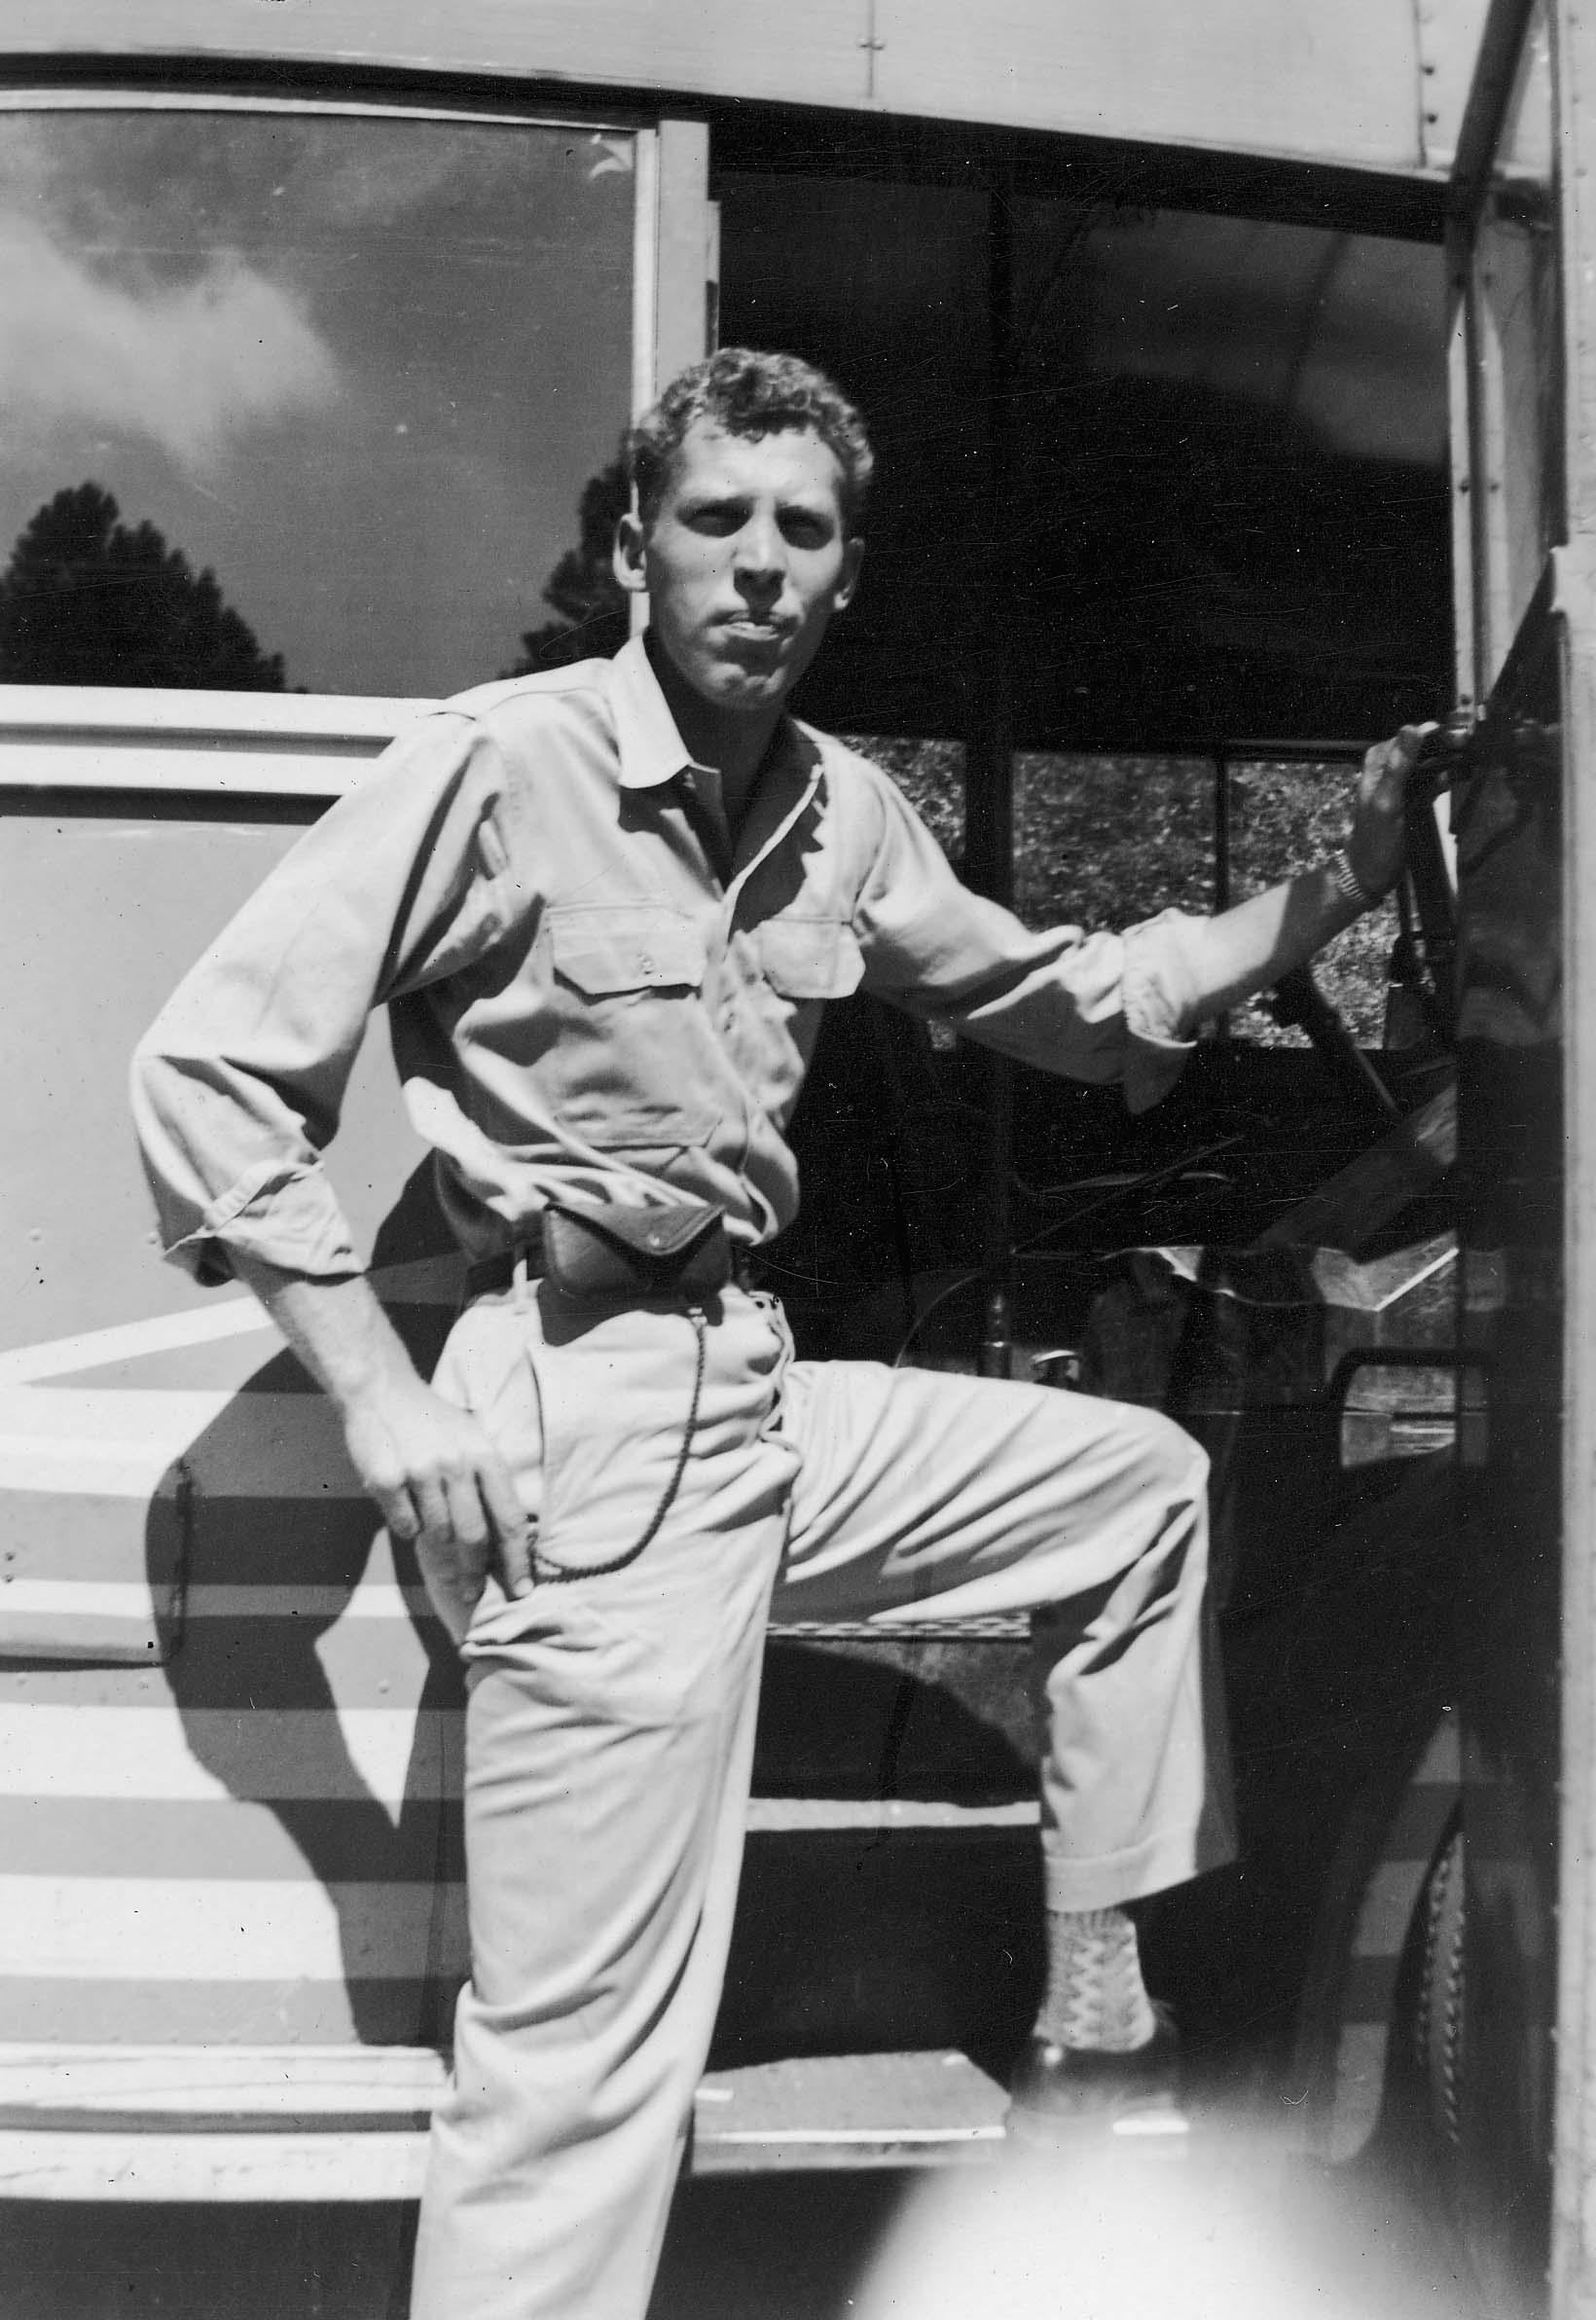 Driver Ike Beem